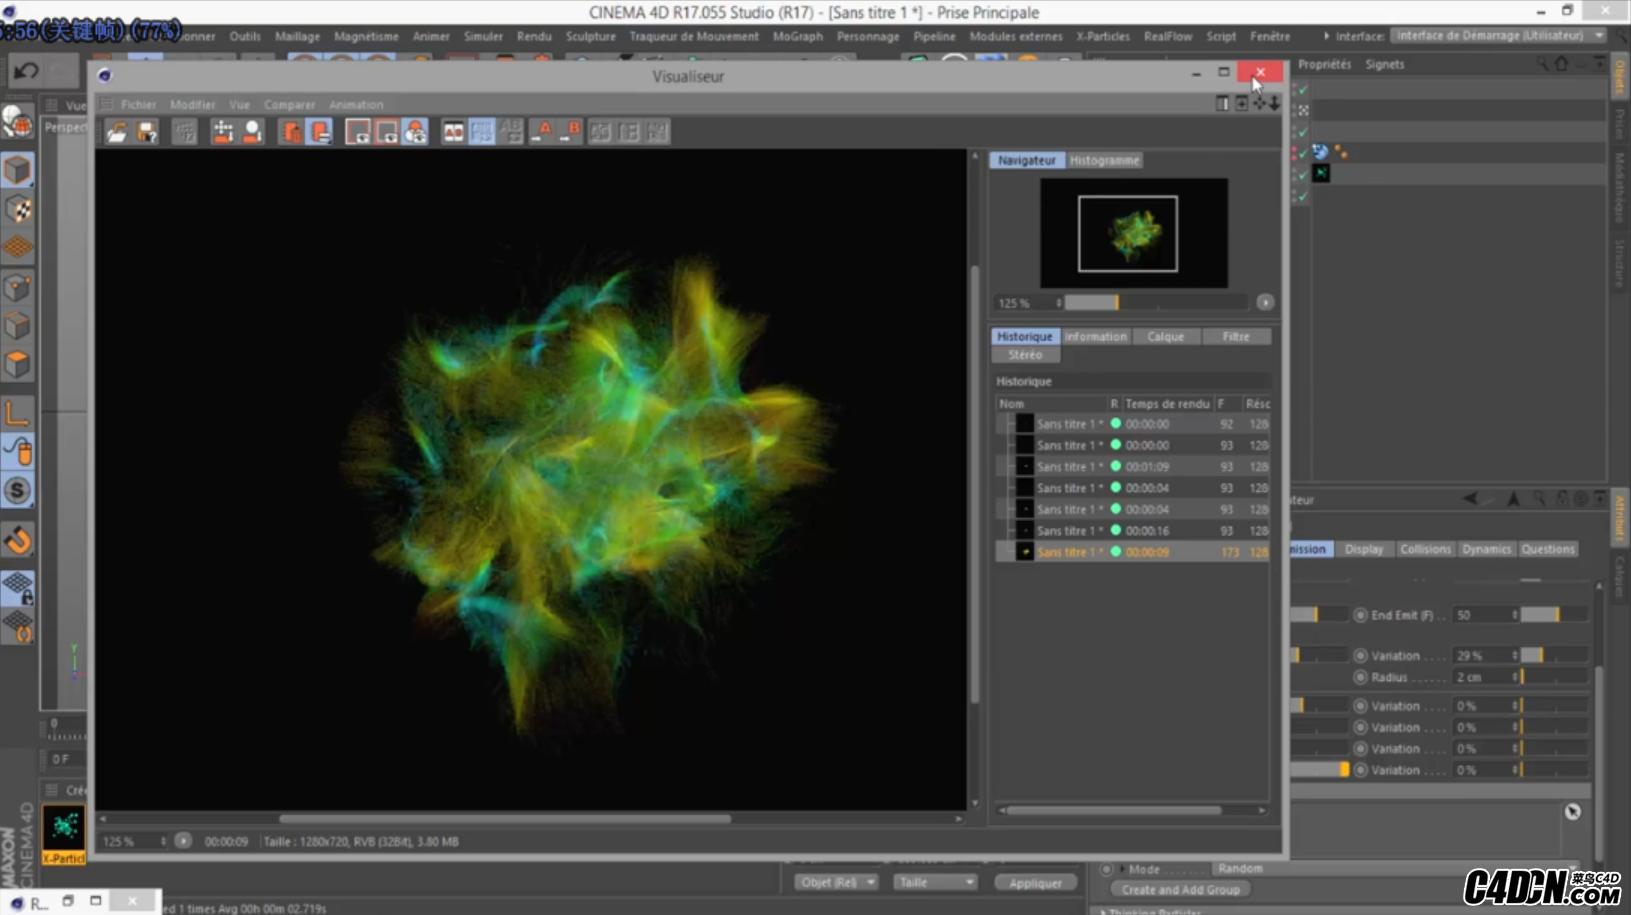 C4D教程-使用X particles与Krakatoa粒子渲染